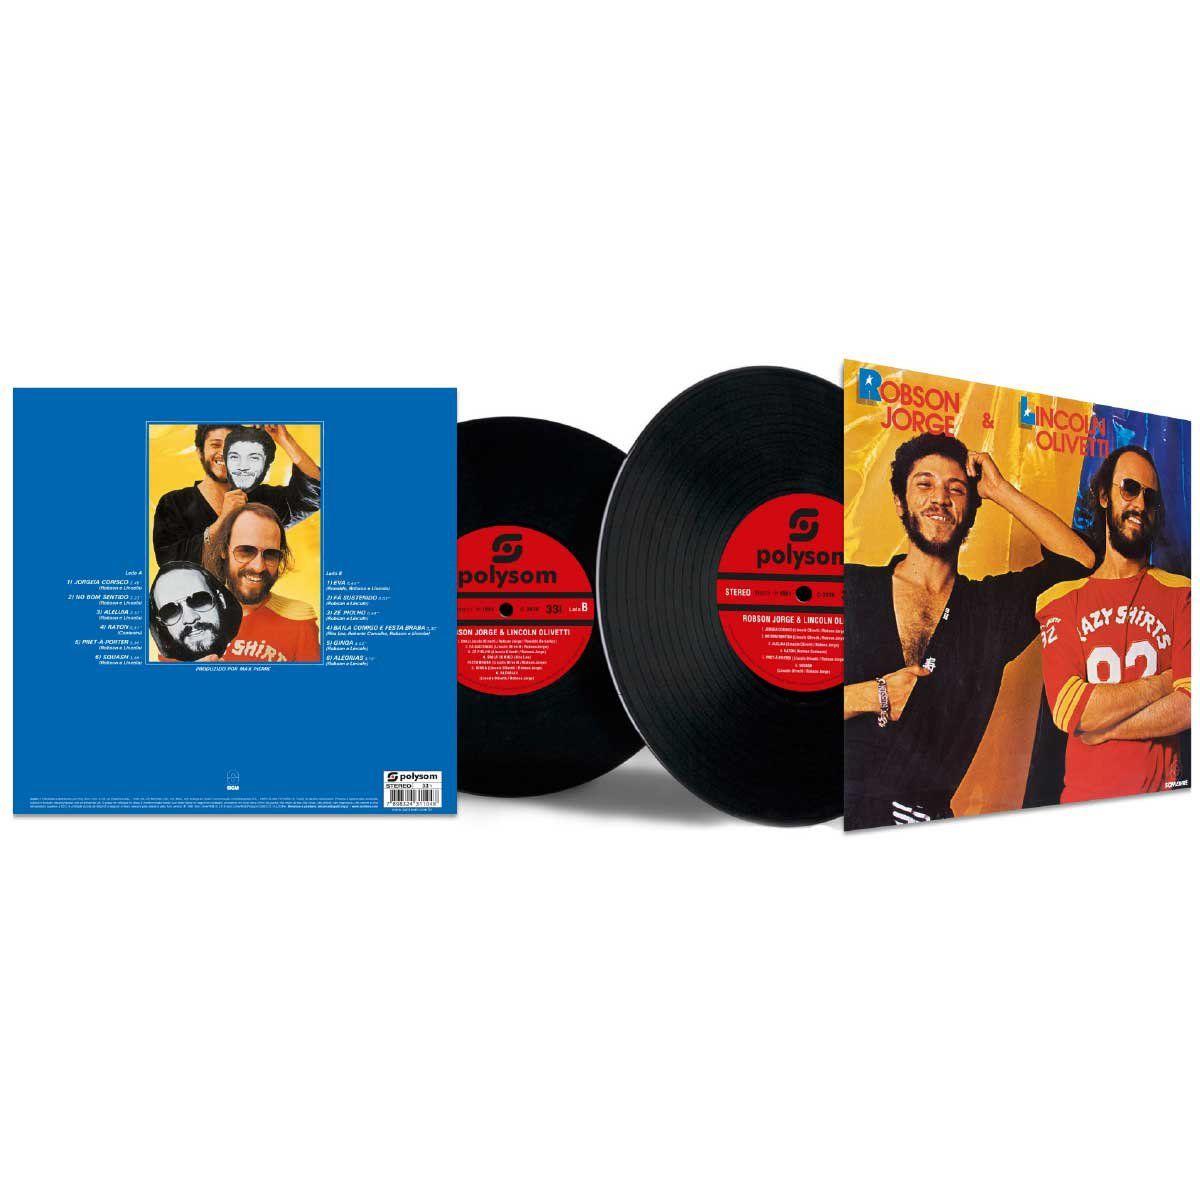 LP Robson Jorge & Lincoln Olivetti  - bandUP Store Marketplace